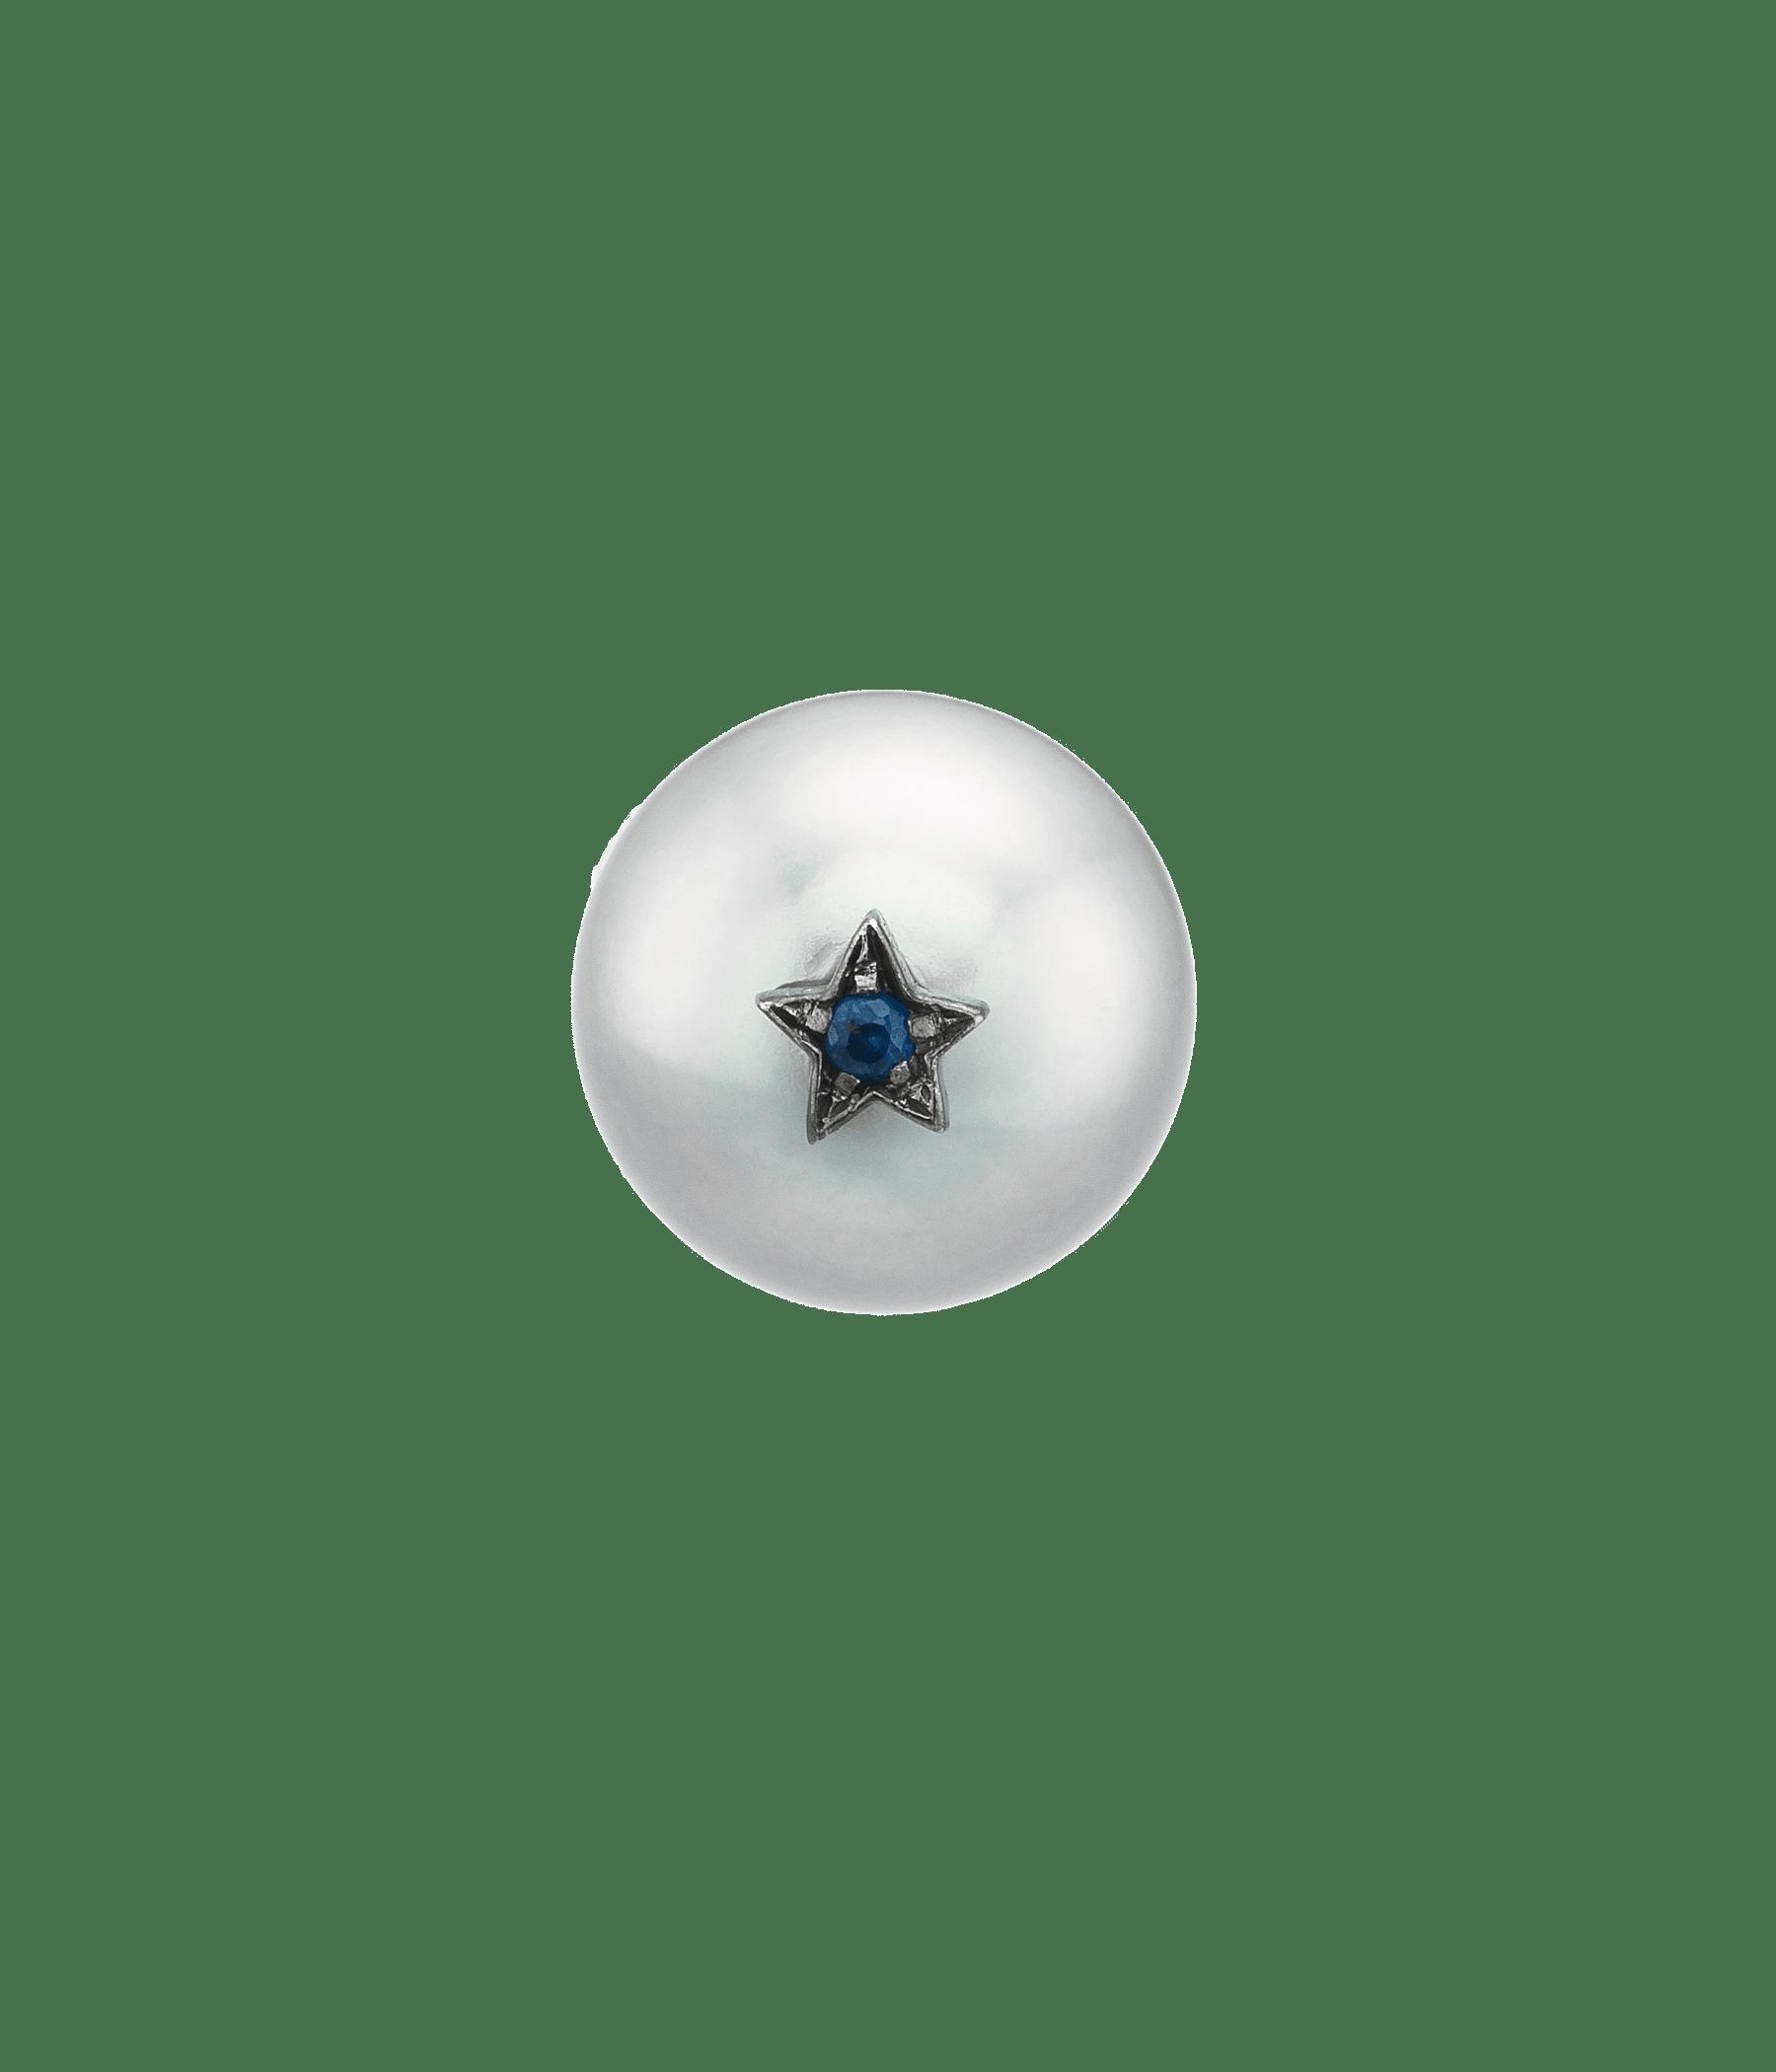 Carolina Bucci Superstellar Pearl Stud with Small Pavé Star Black Gold